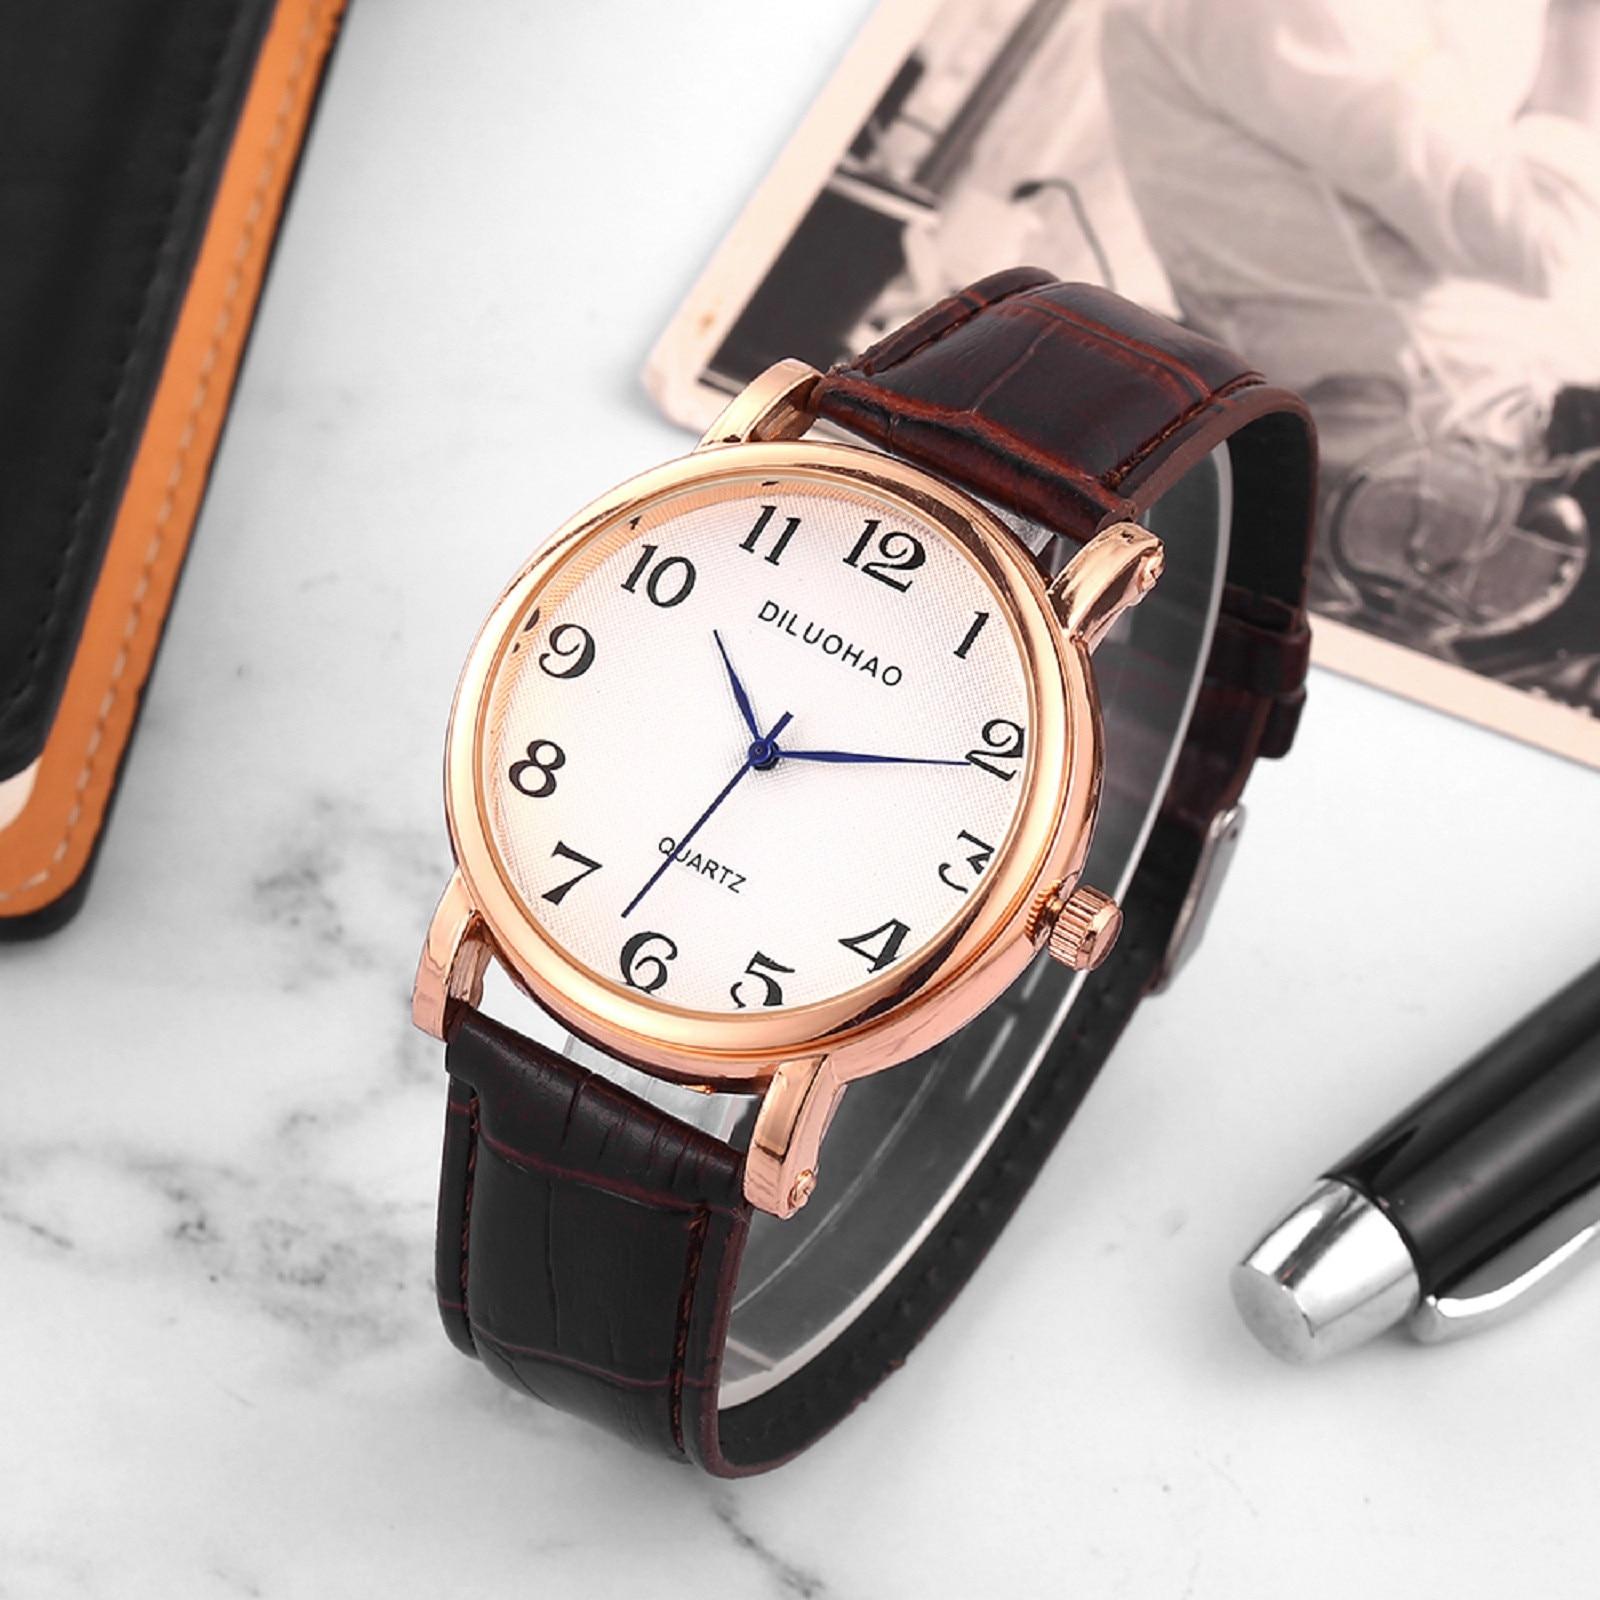 Men's Women's Quartz Watch Arabic Numerals Big Dial Watch for Couple Retro Brown Black Leather Strap